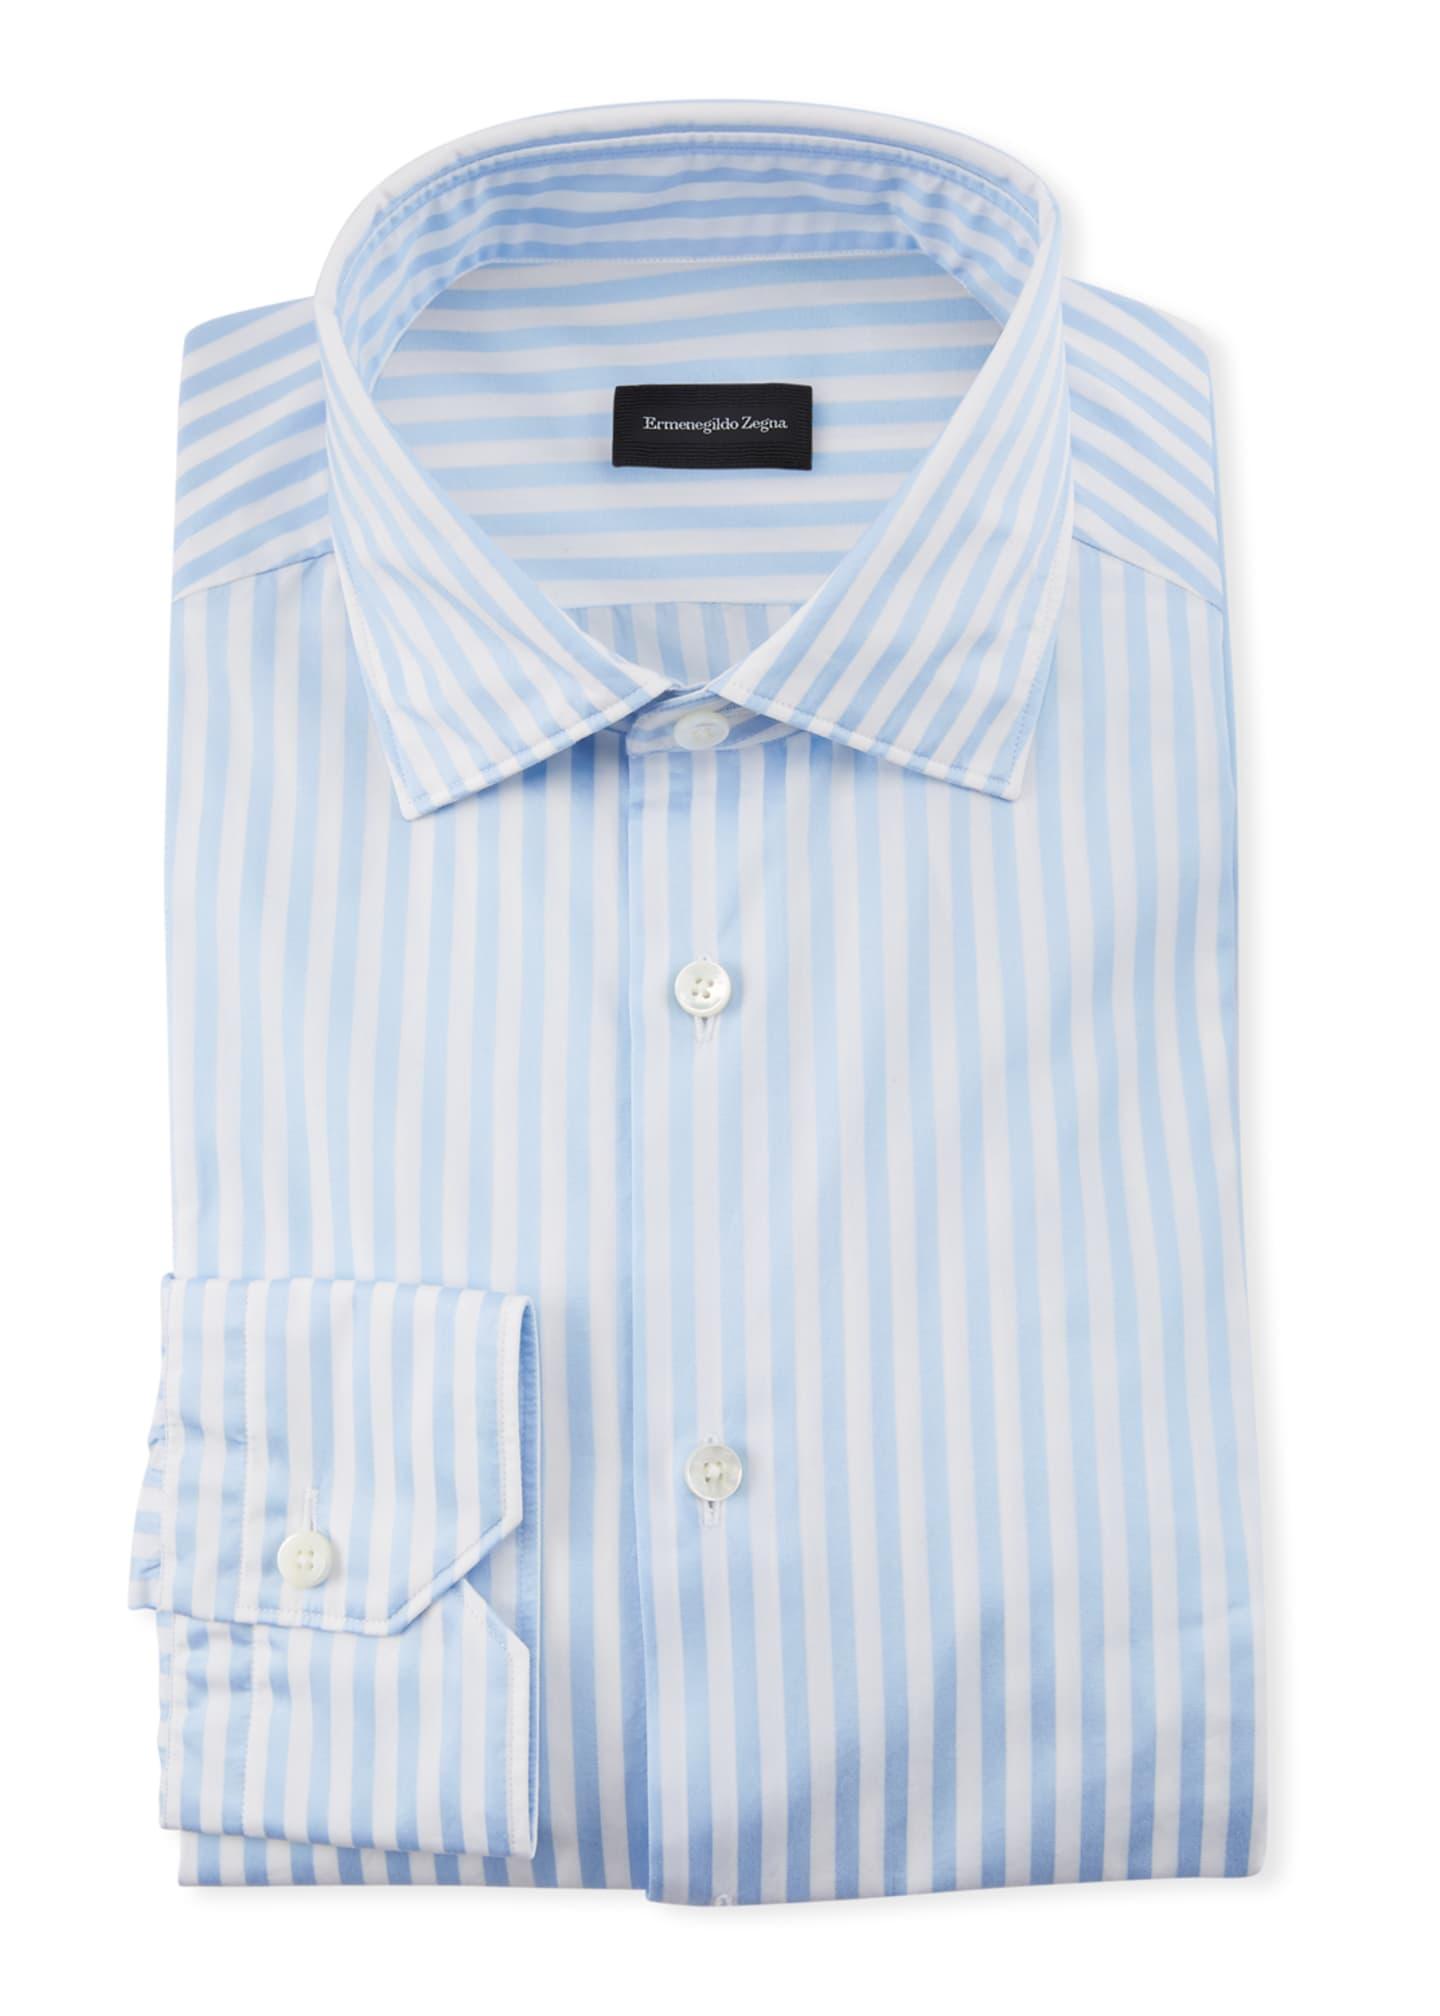 Ermenegildo Zegna Men's Bengal Dress Shirt